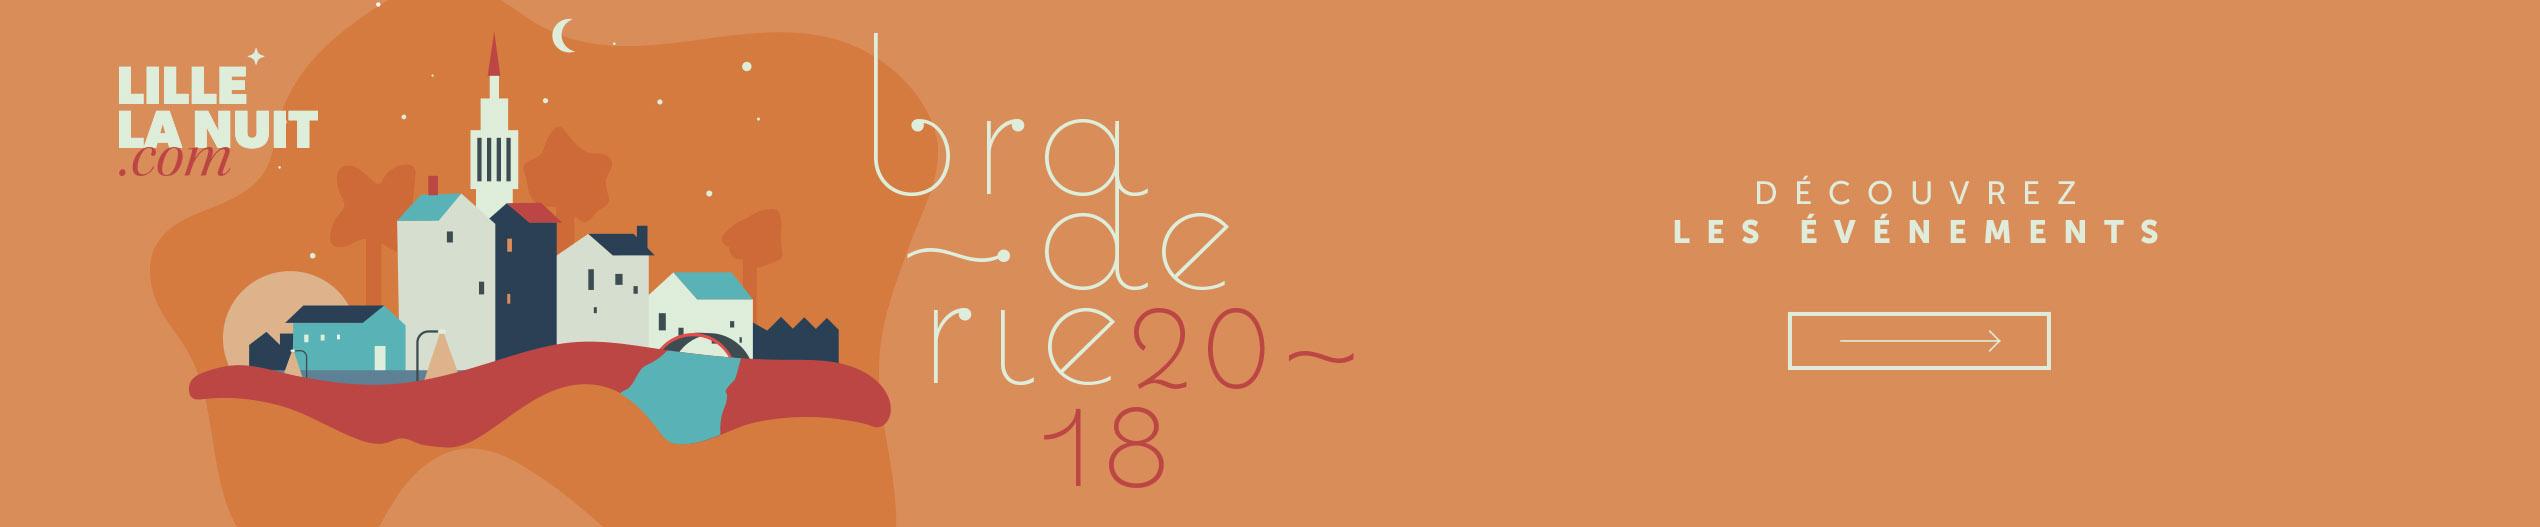 Braderie de Lille 2018